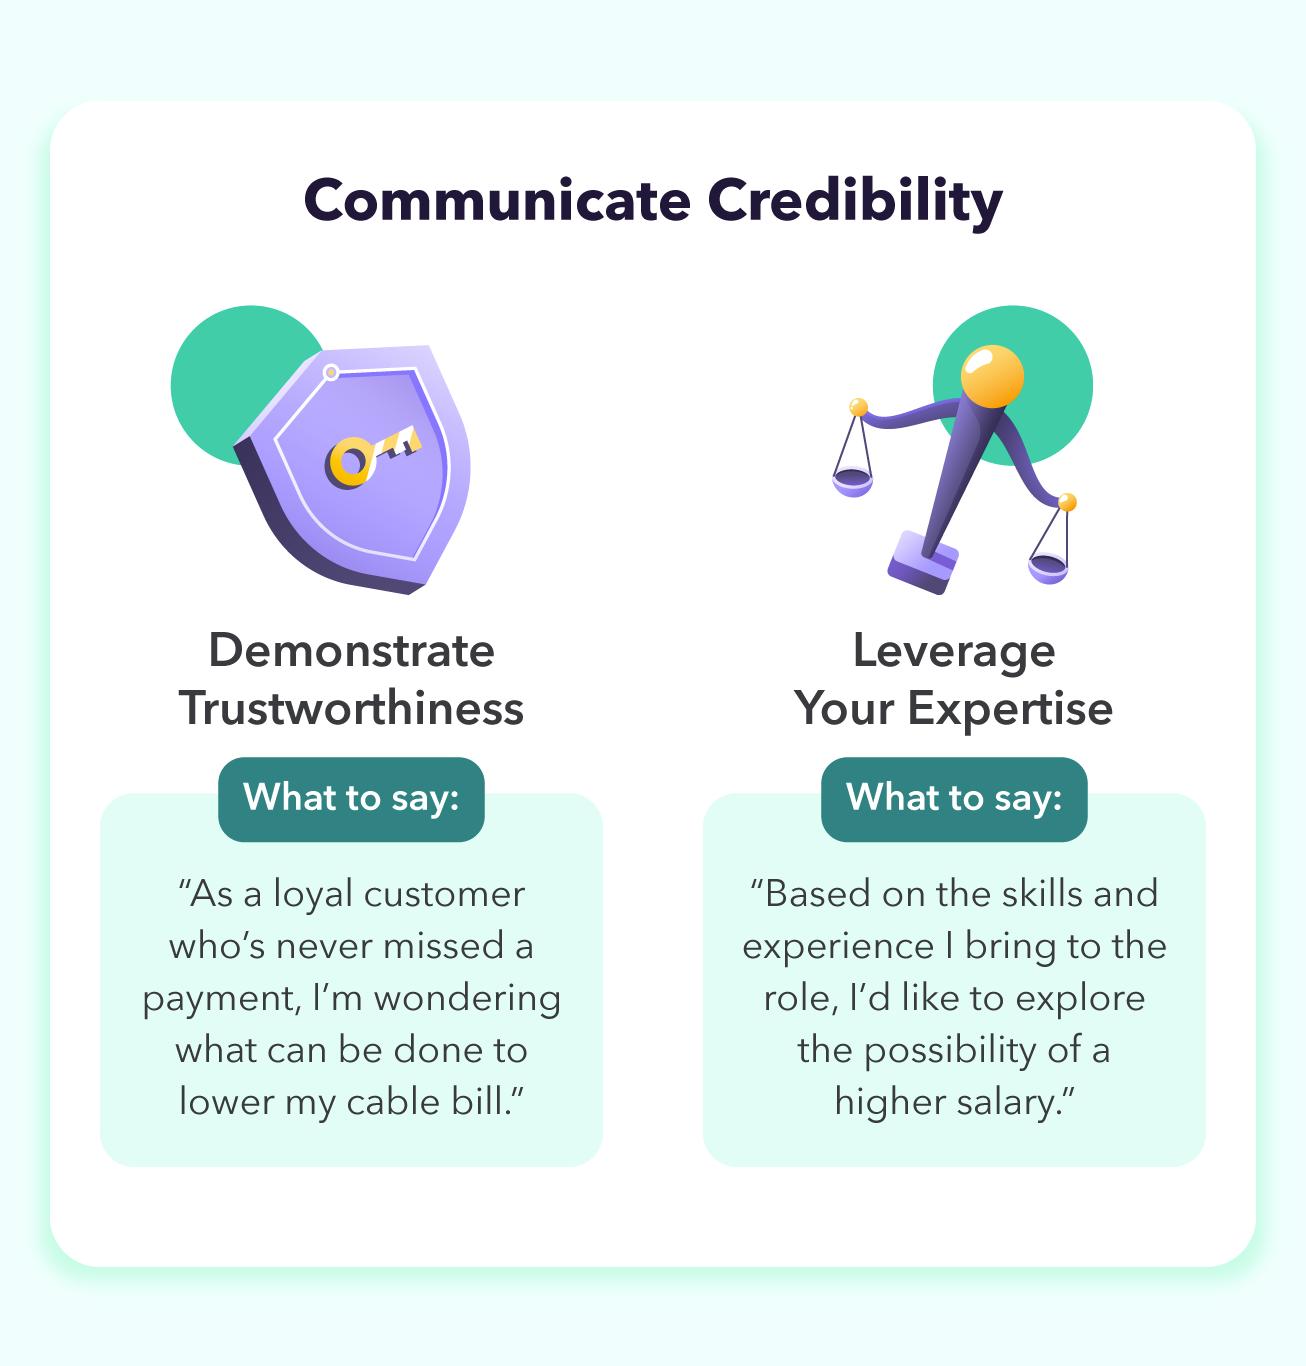 communicate-credibility